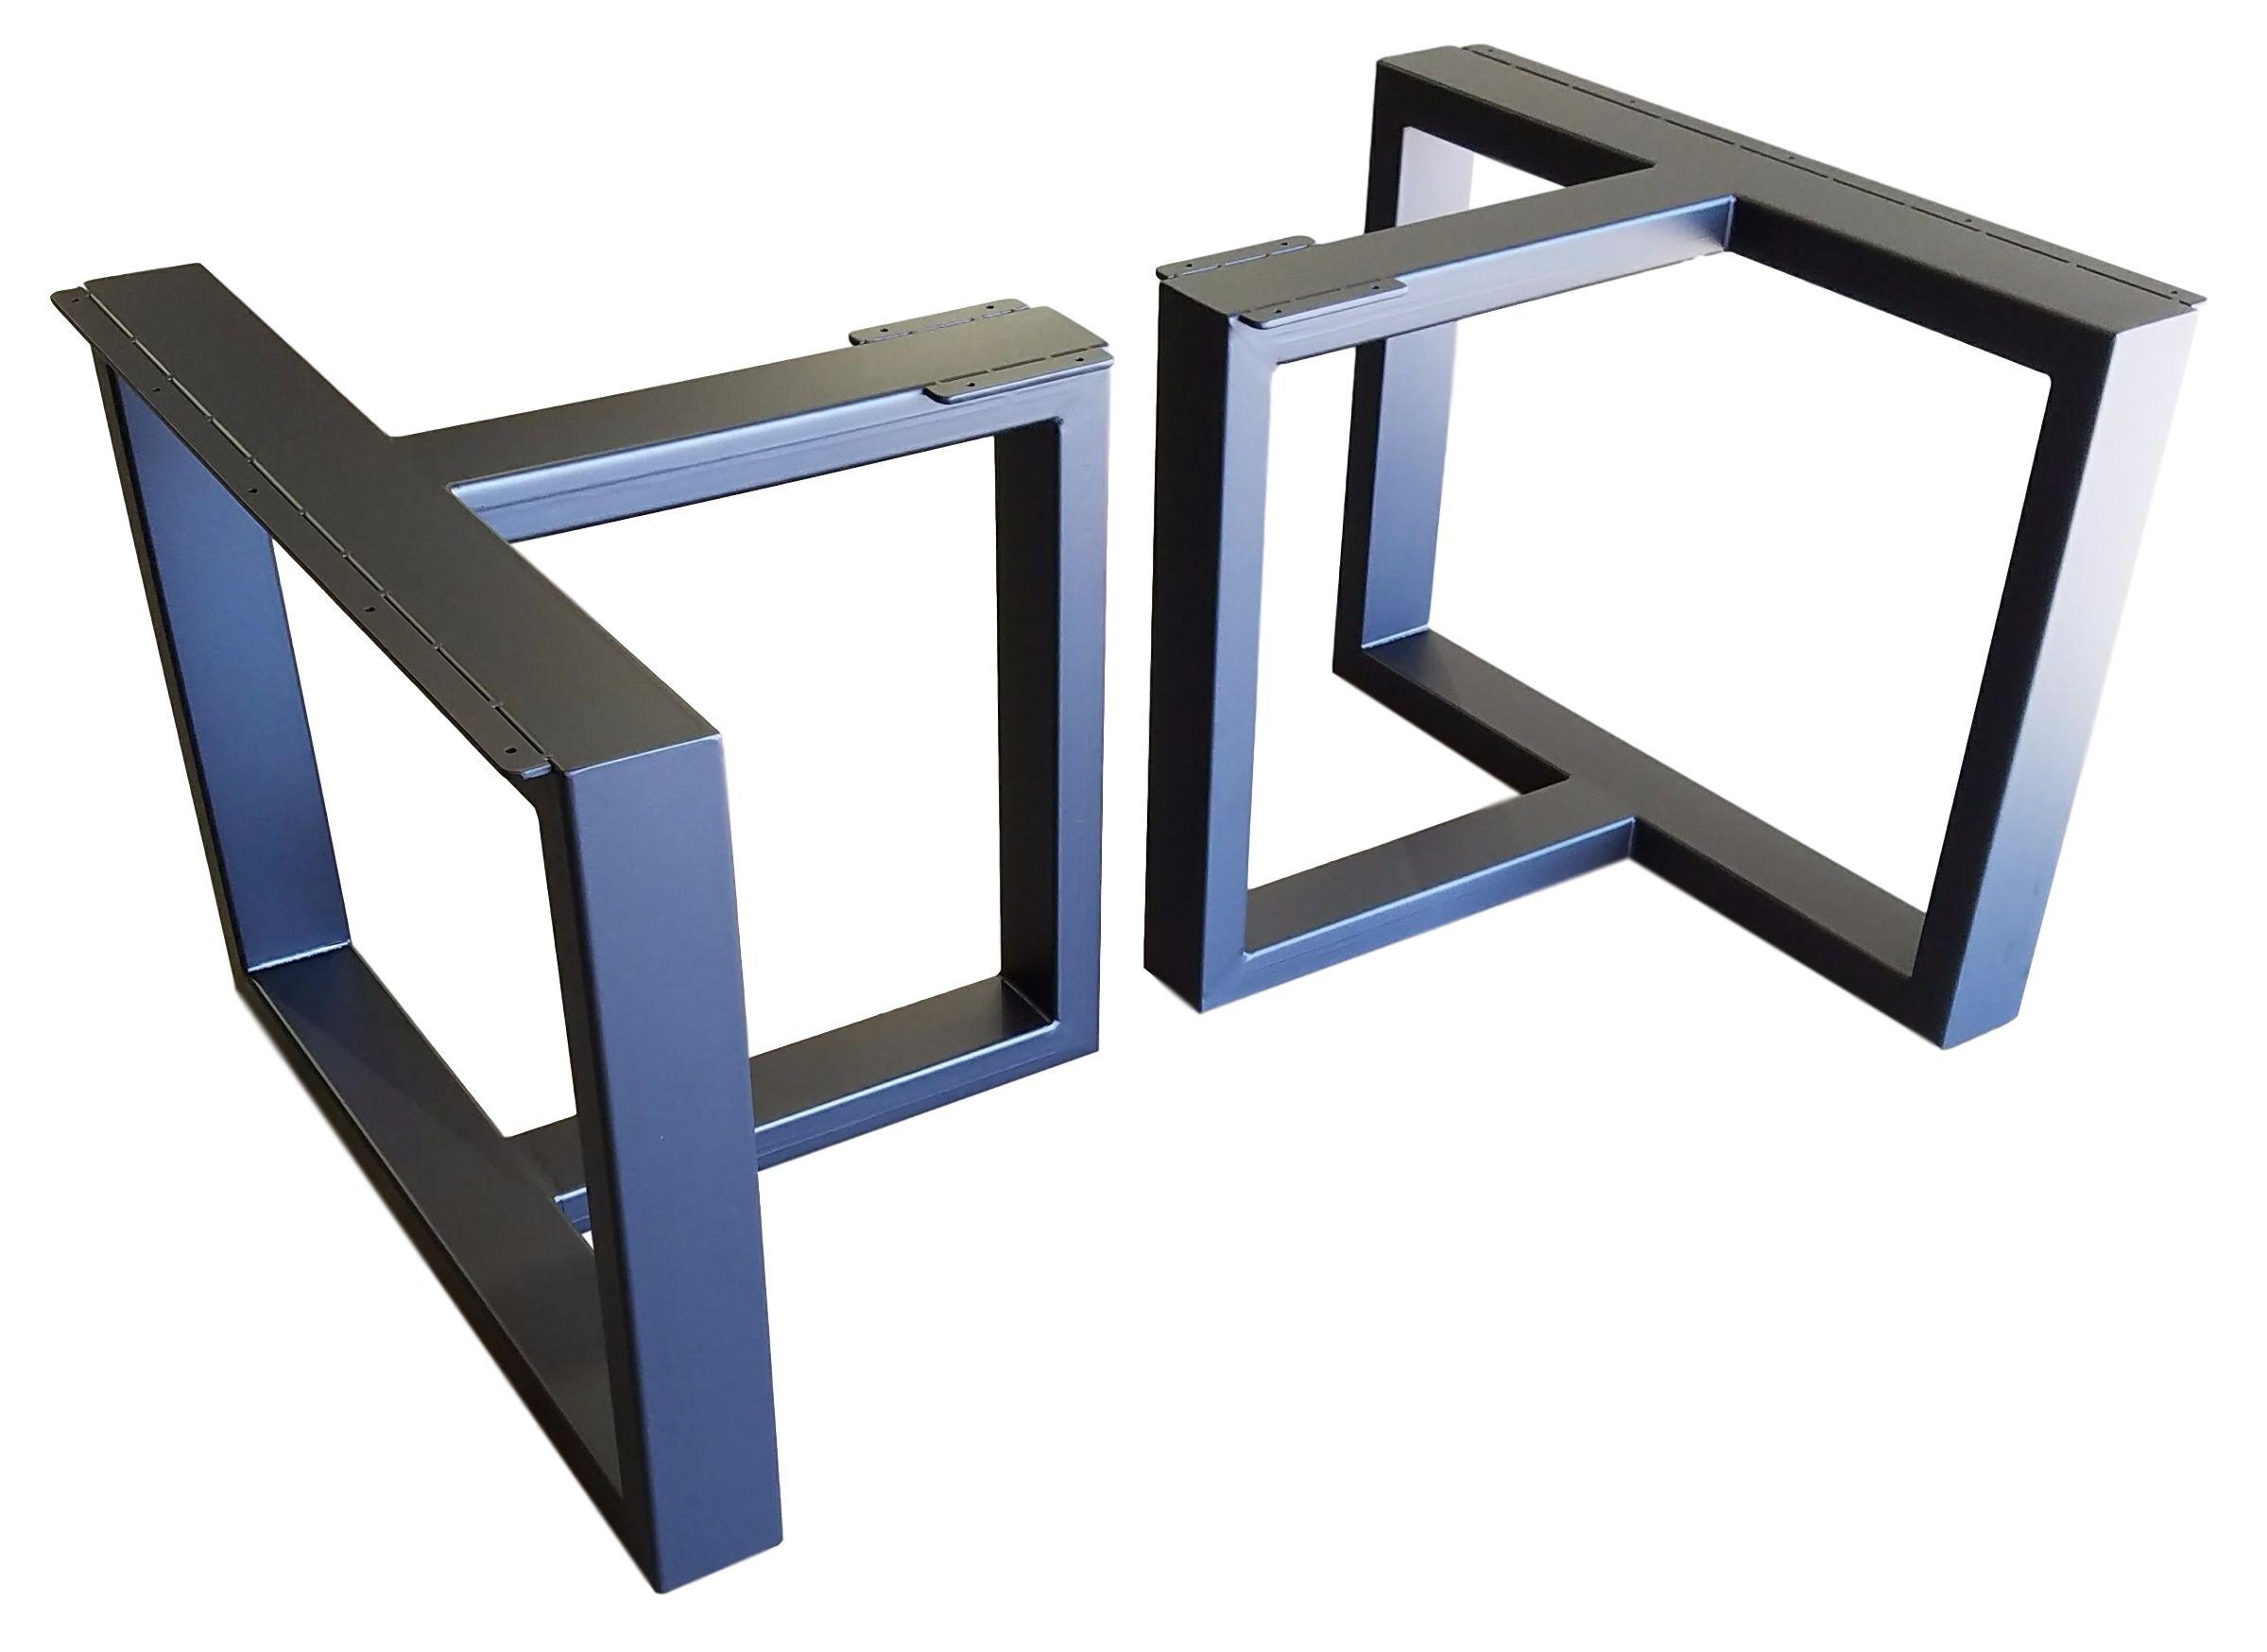 Custom Metal Table Legs Tribeca By Urban Ironcraft CustomMadecom - How to make metal table legs